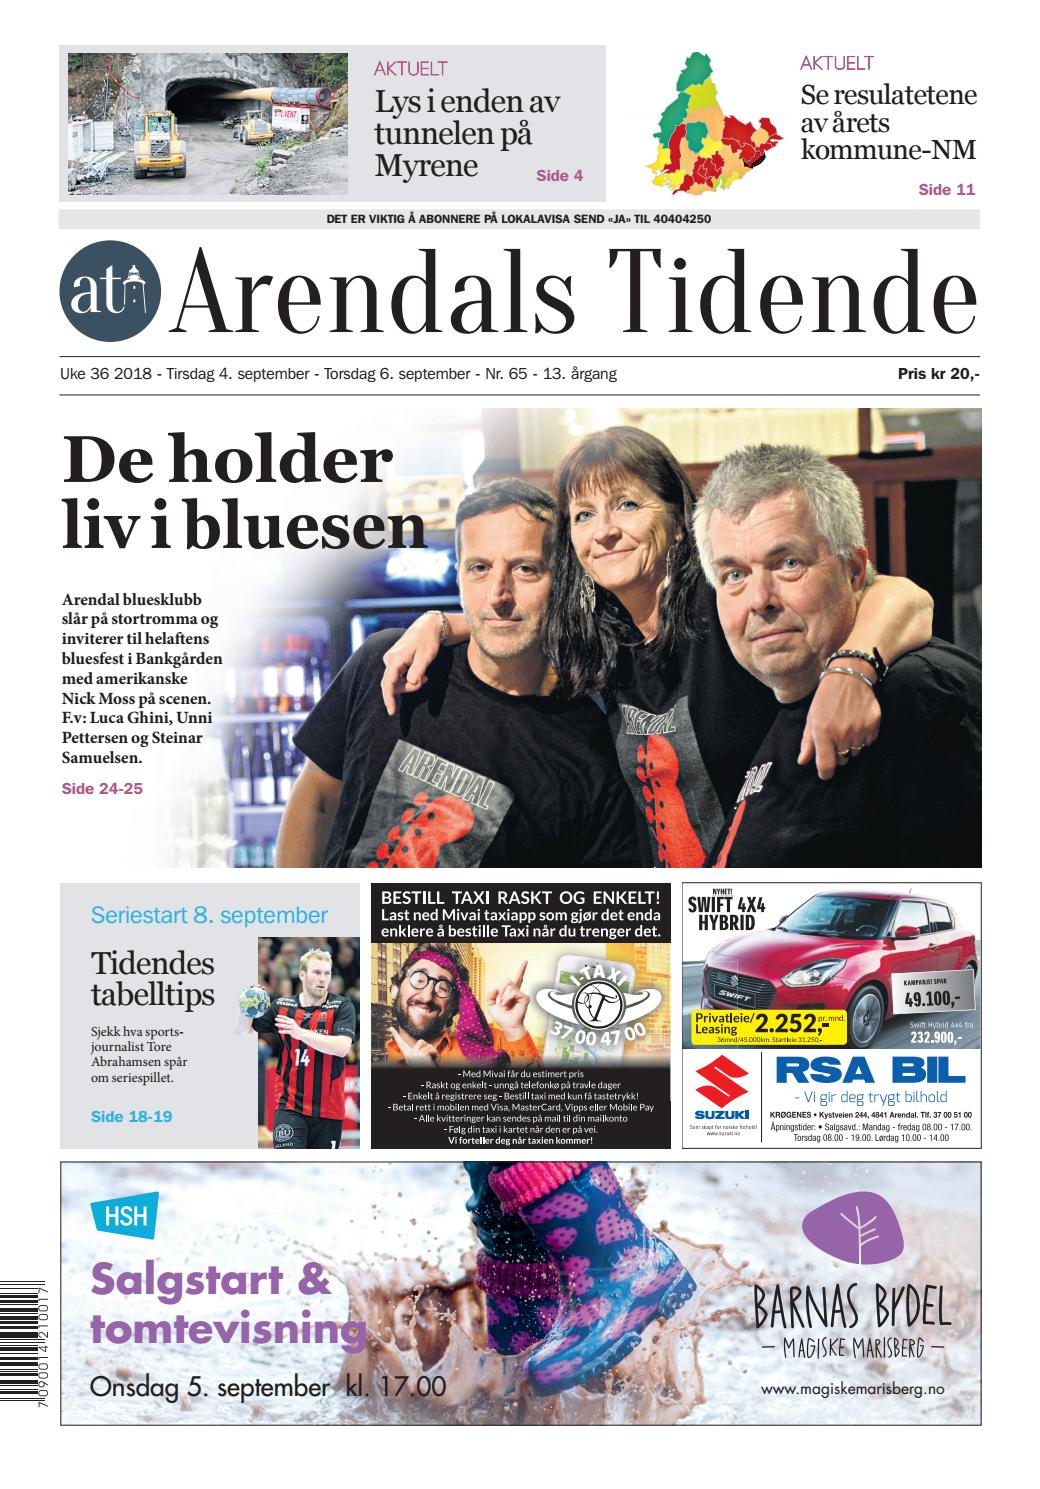 9280c625 Arendals Tidende uke 36 - nr 65 by Tvende Media AS - issuu